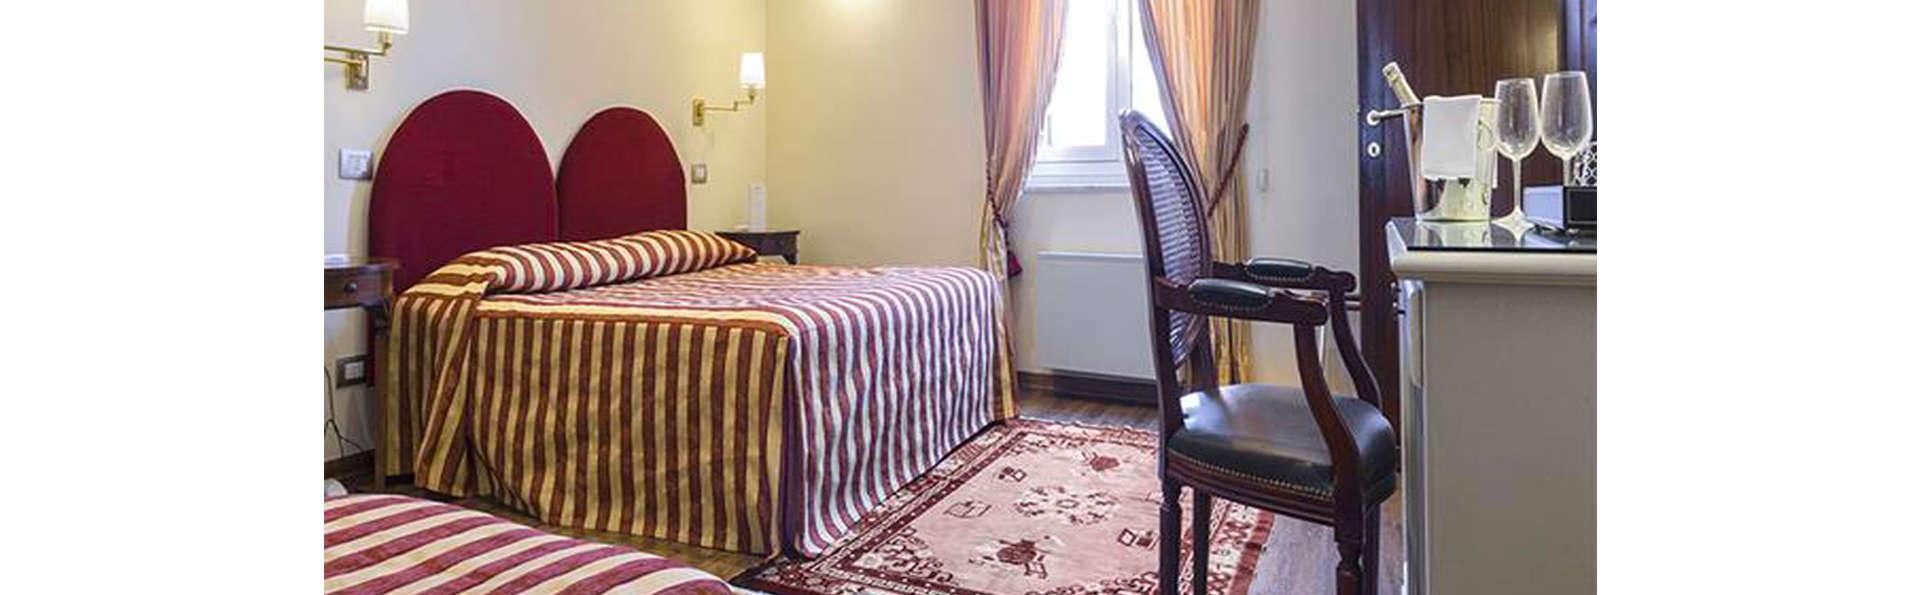 Hotel Firenze E Continentale  - EDIT_ROOM_01.jpg